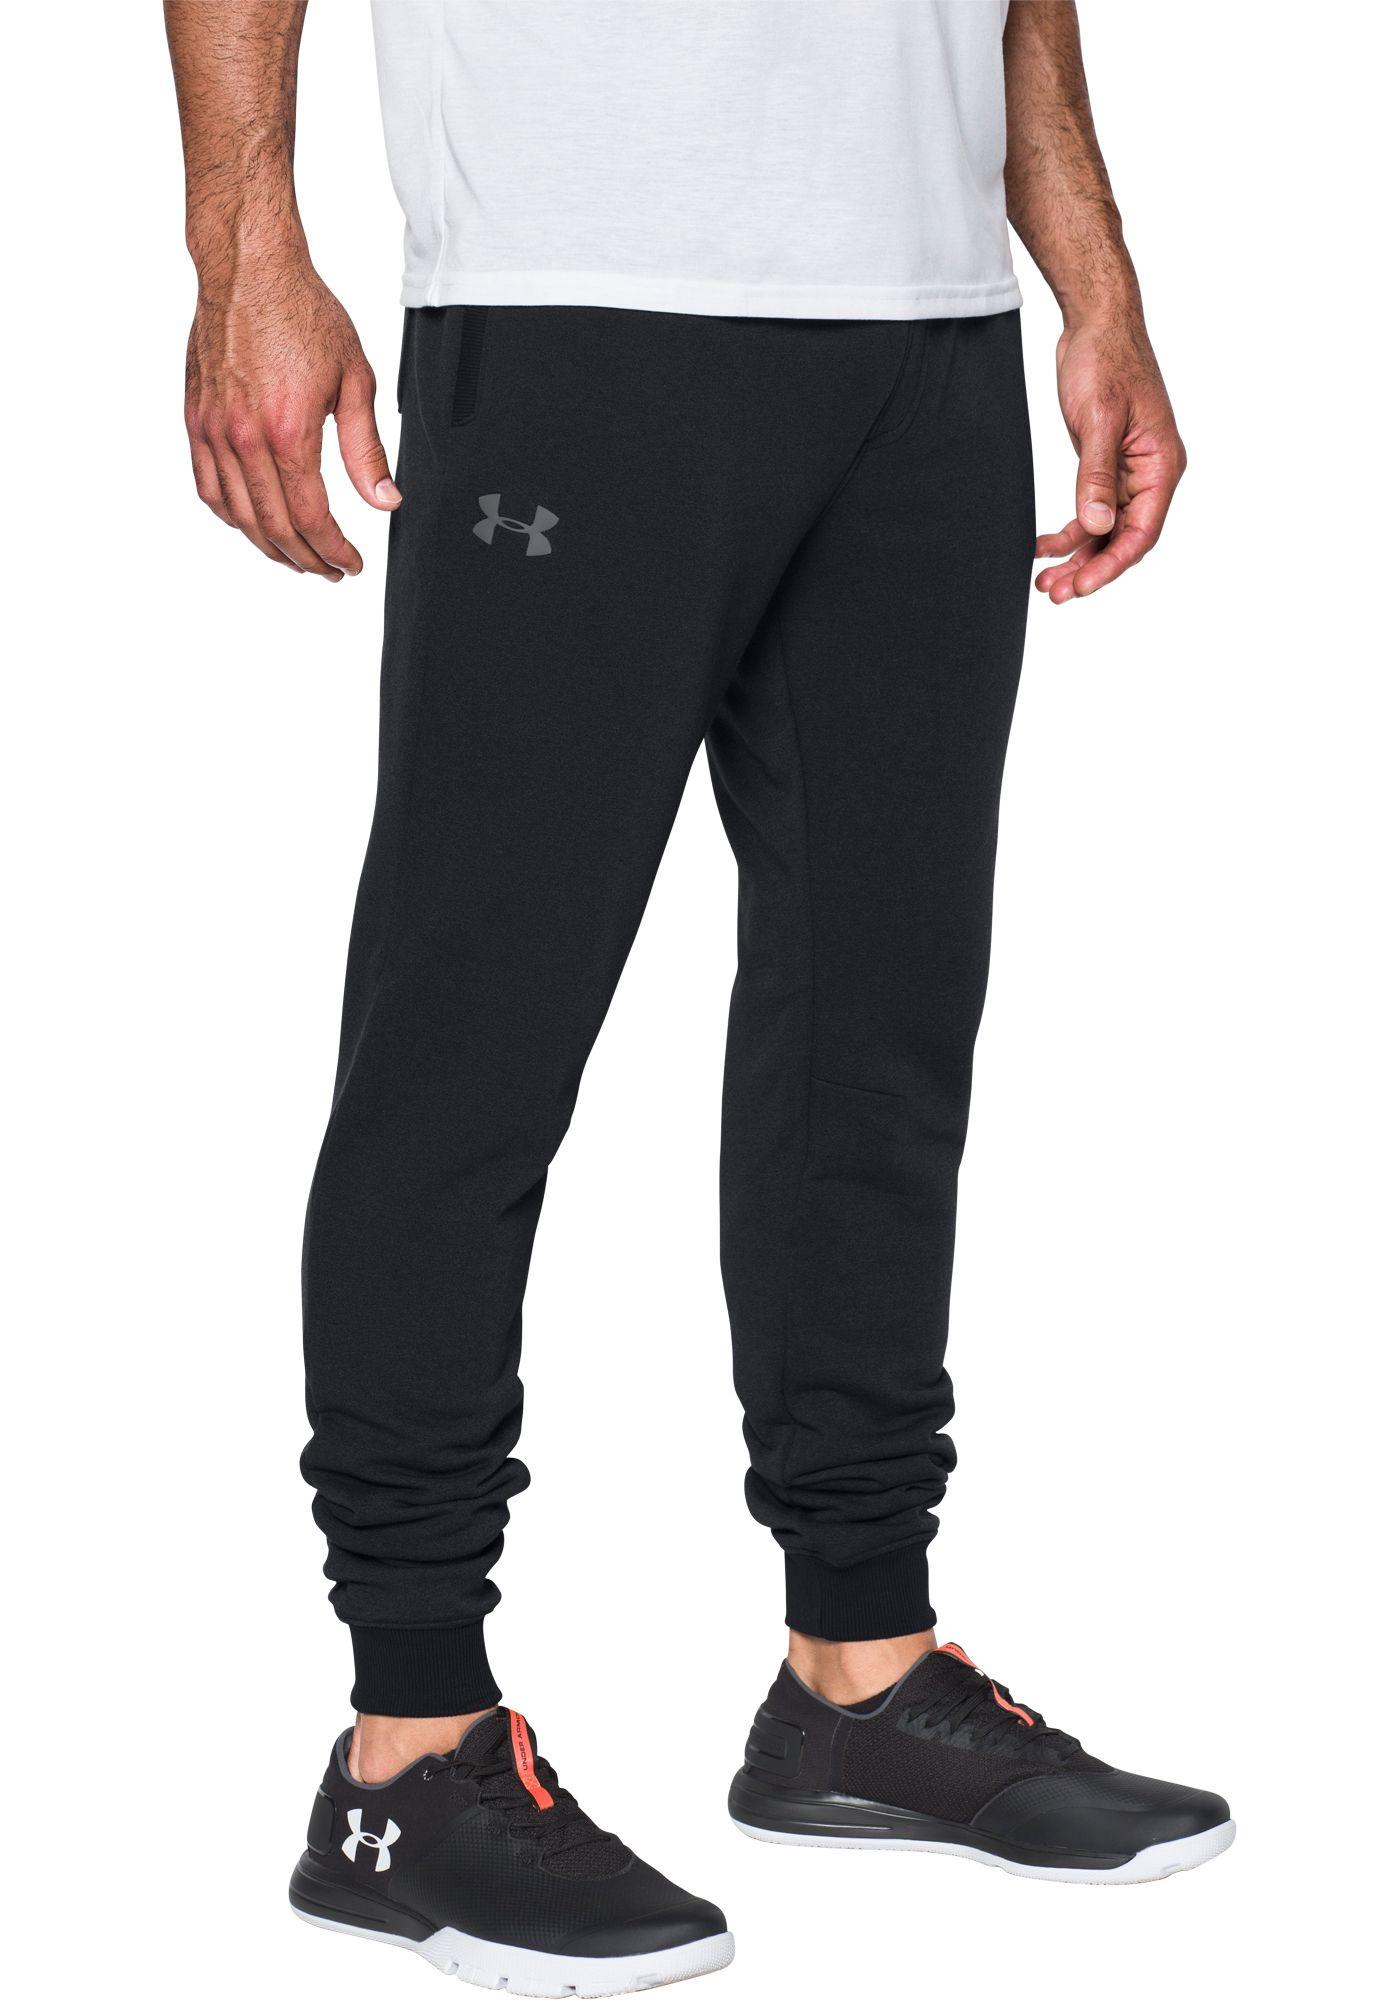 Under Armour Men's Threadborne Fleece Stacked Jogger Pants (Regular and Big & Tall)